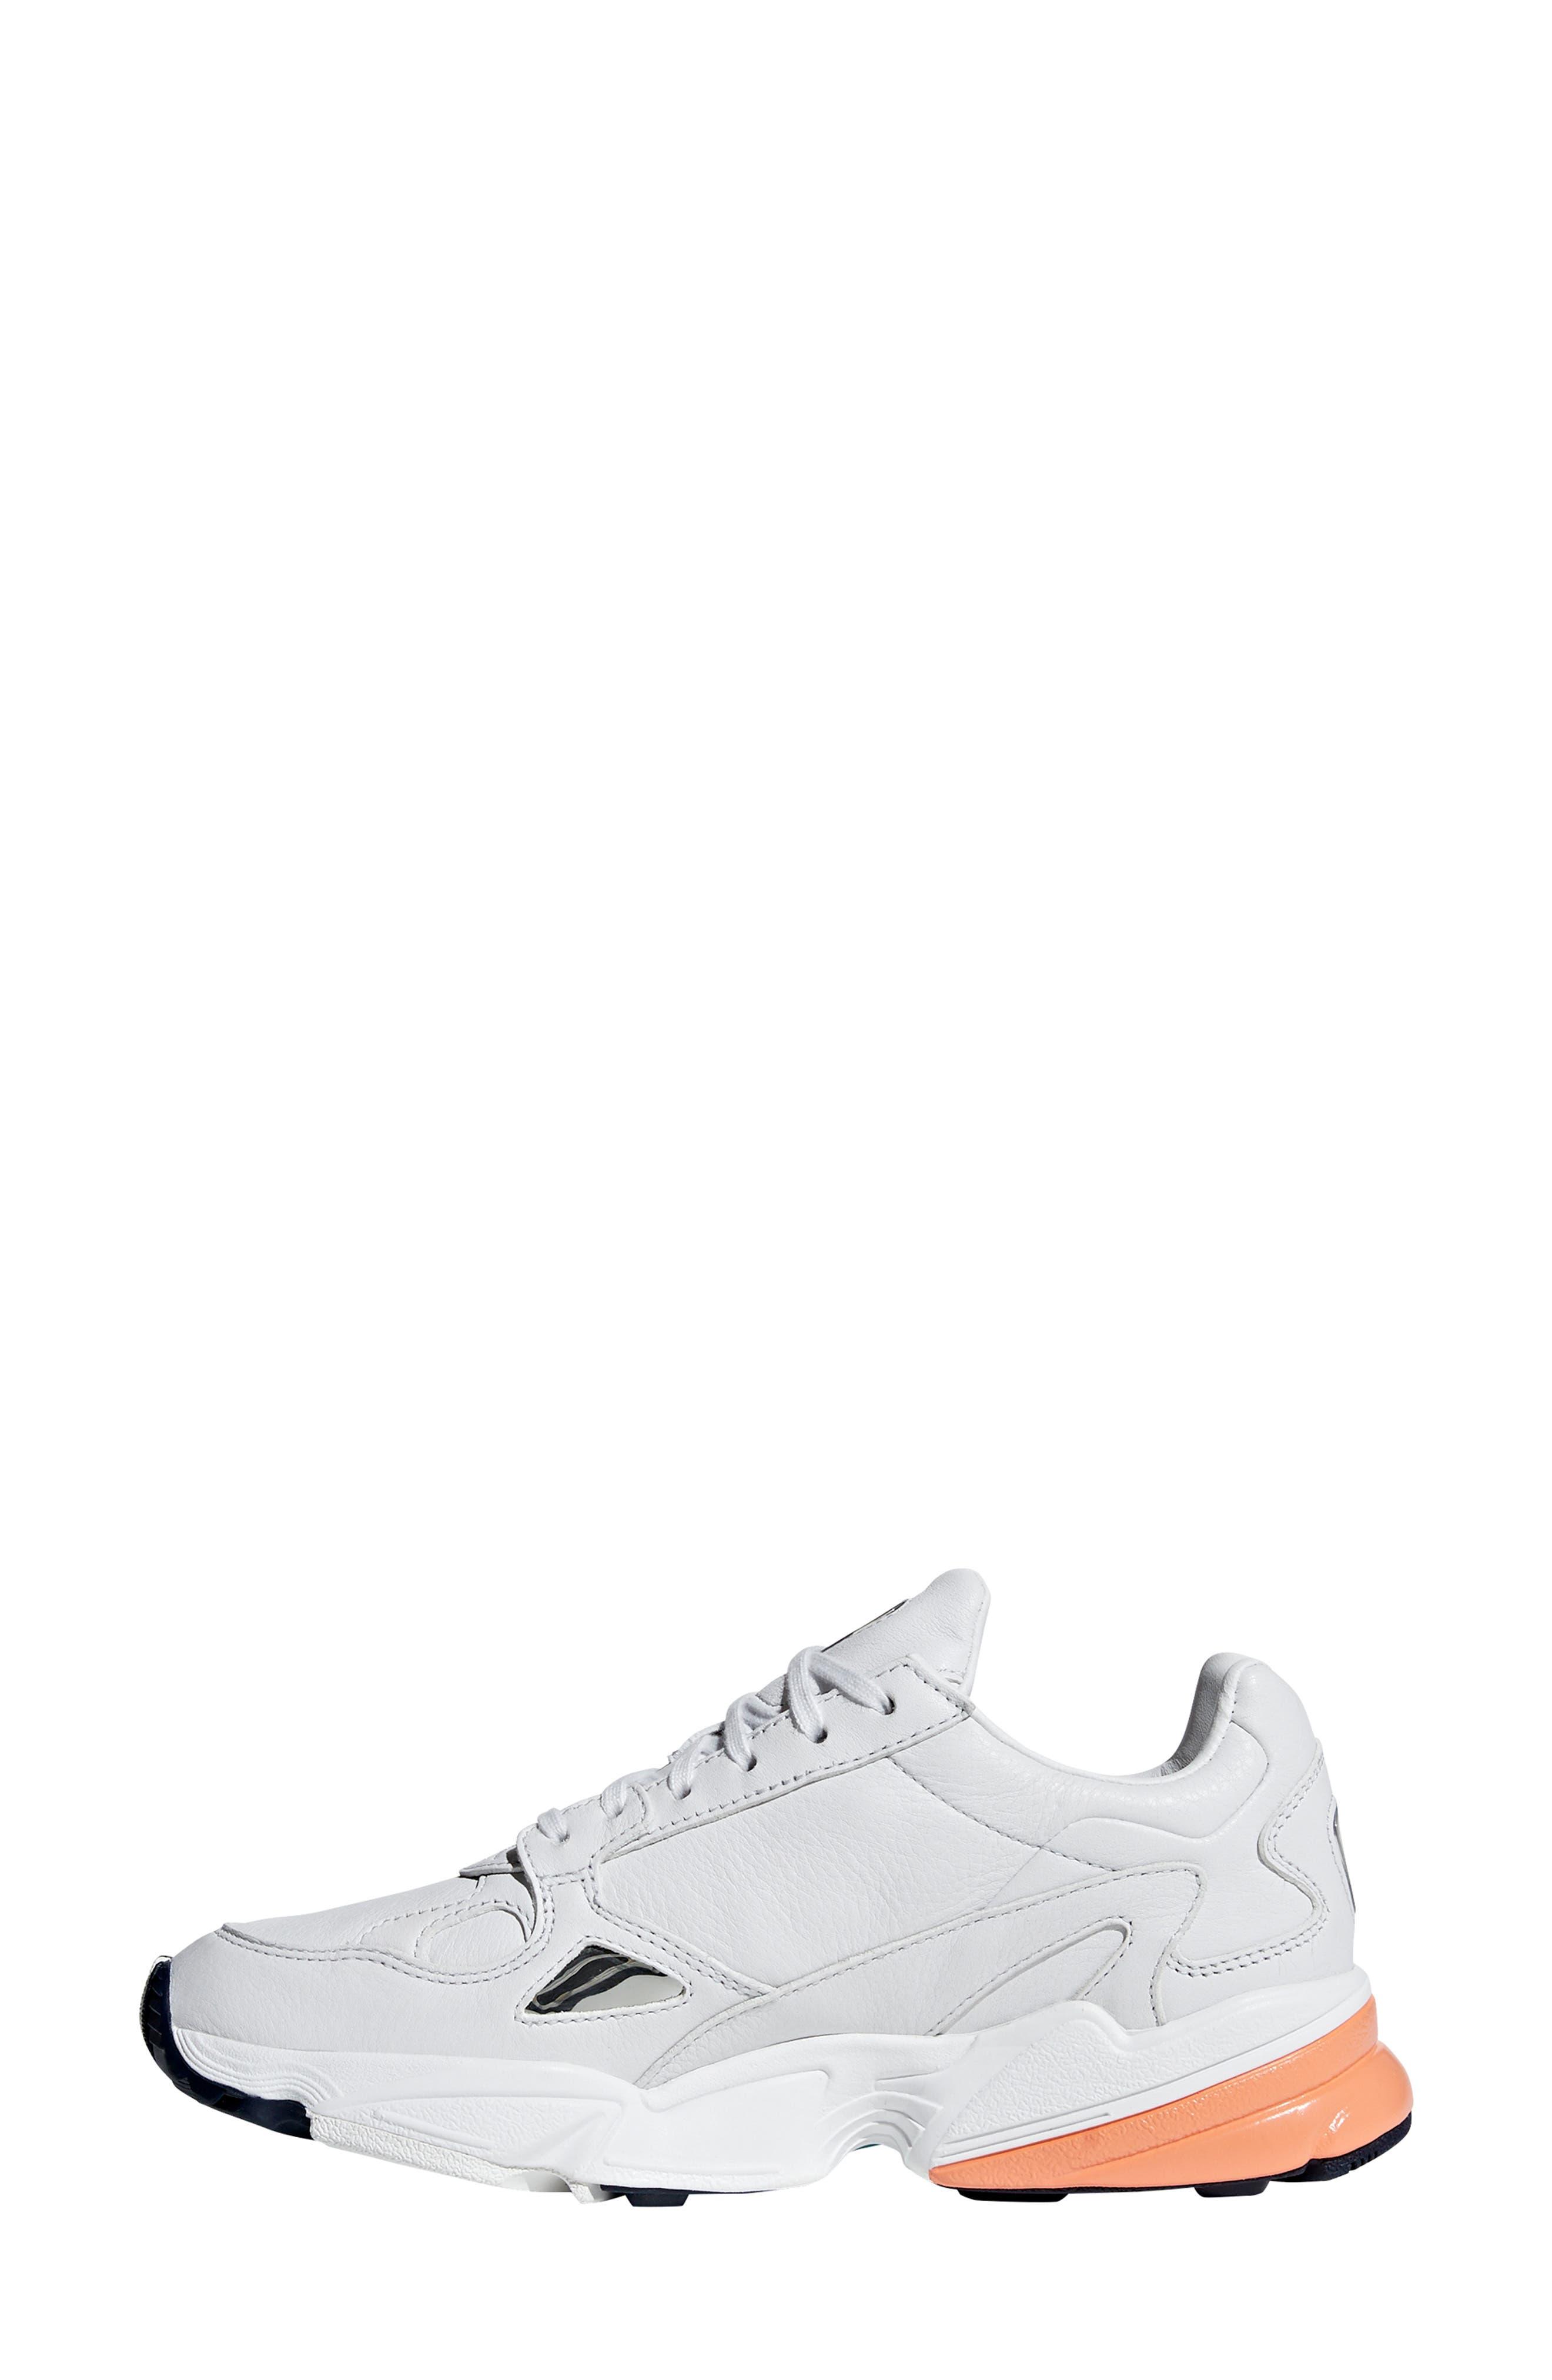 Falcon Sneaker,                             Alternate thumbnail 5, color,                             CRYSTAL WHITE/ EASY ORANGE